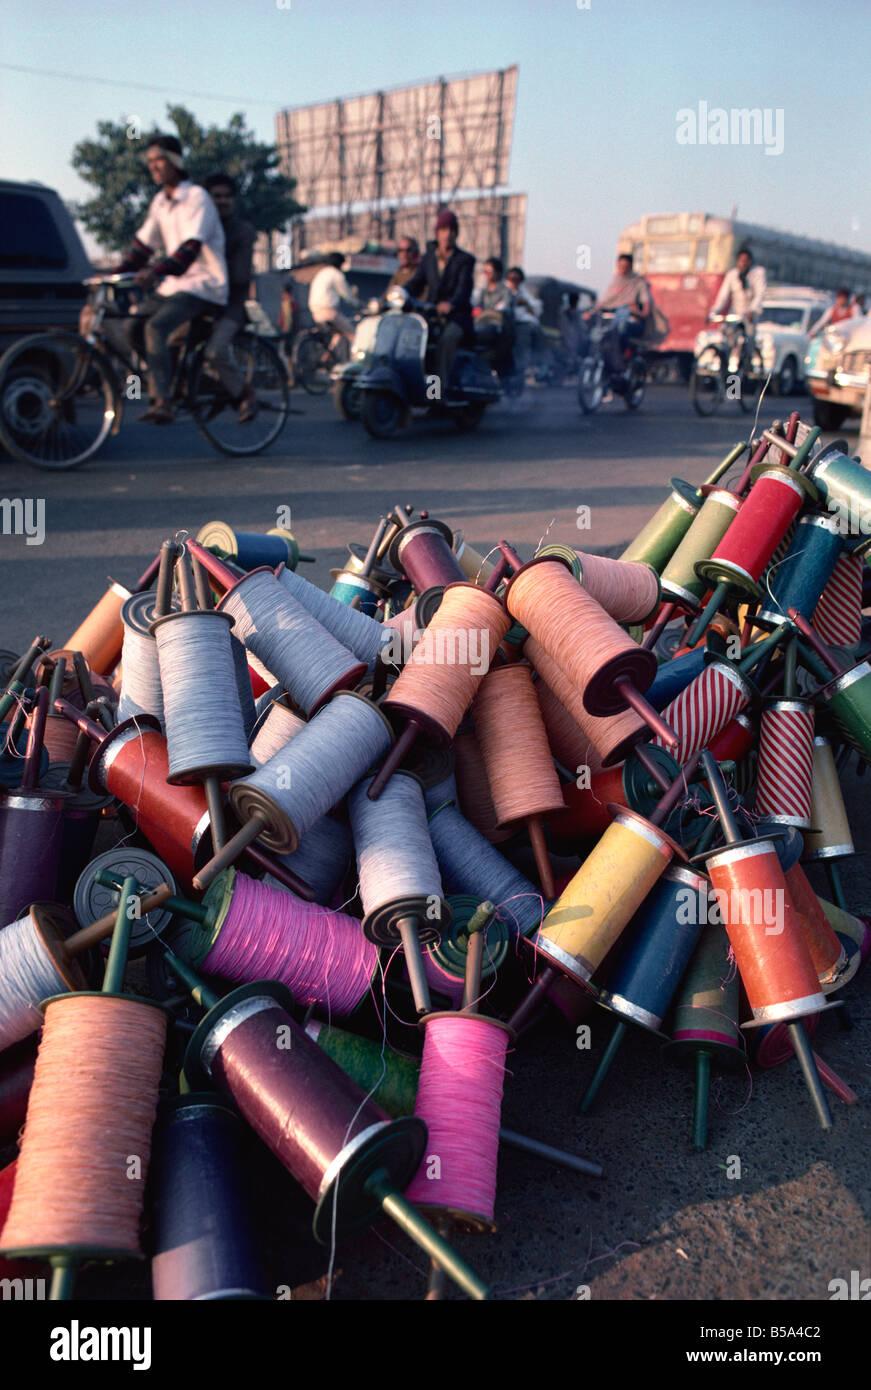 Kite spools Kite Festival in January Ahmedabad Gujarat state India Asia - Stock Image